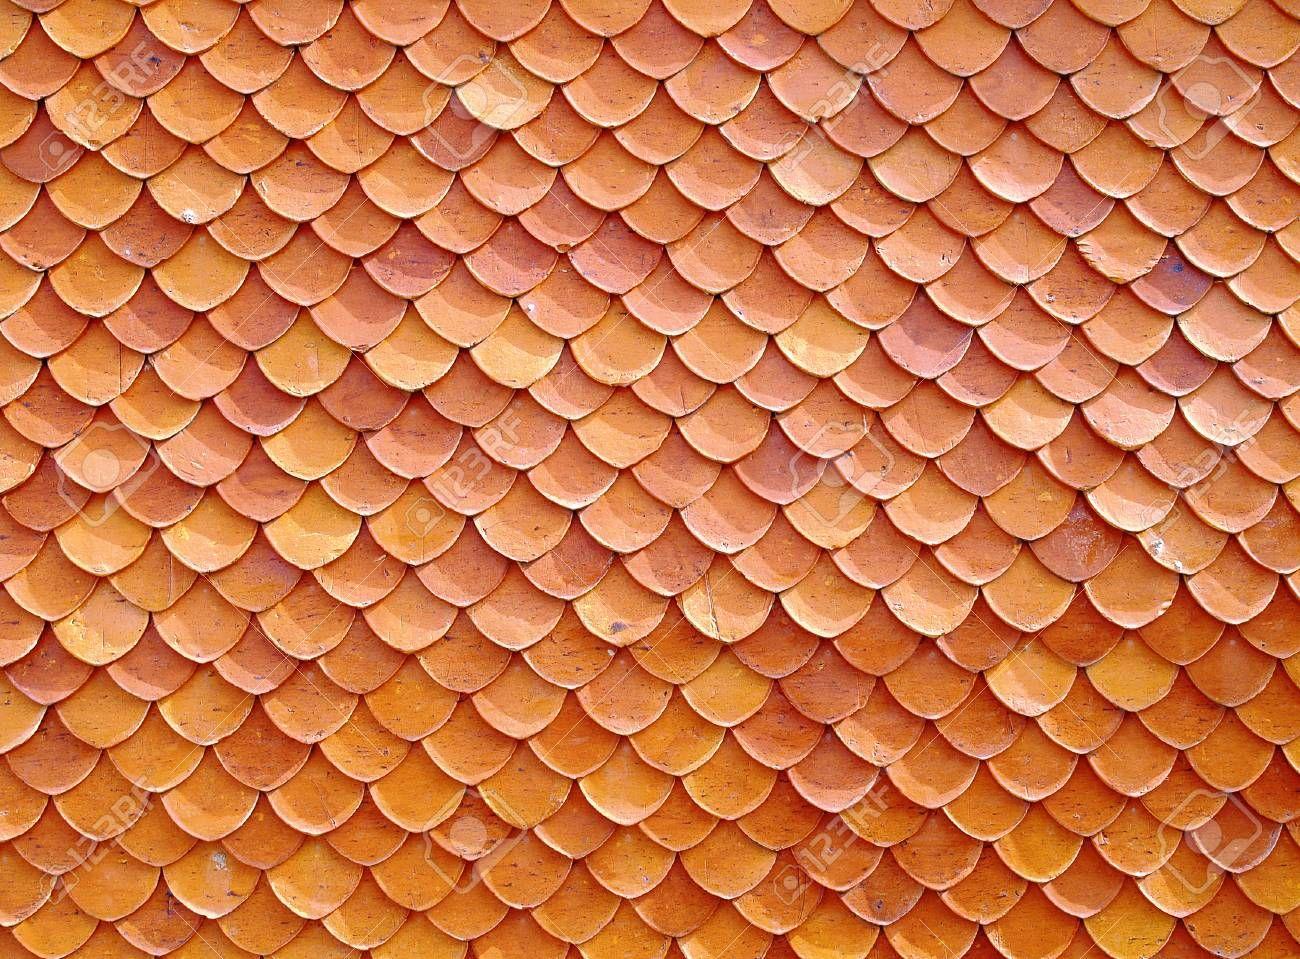 Best Stock Photo In 2020 Red Bricks Roof Tiles Brick 400 x 300